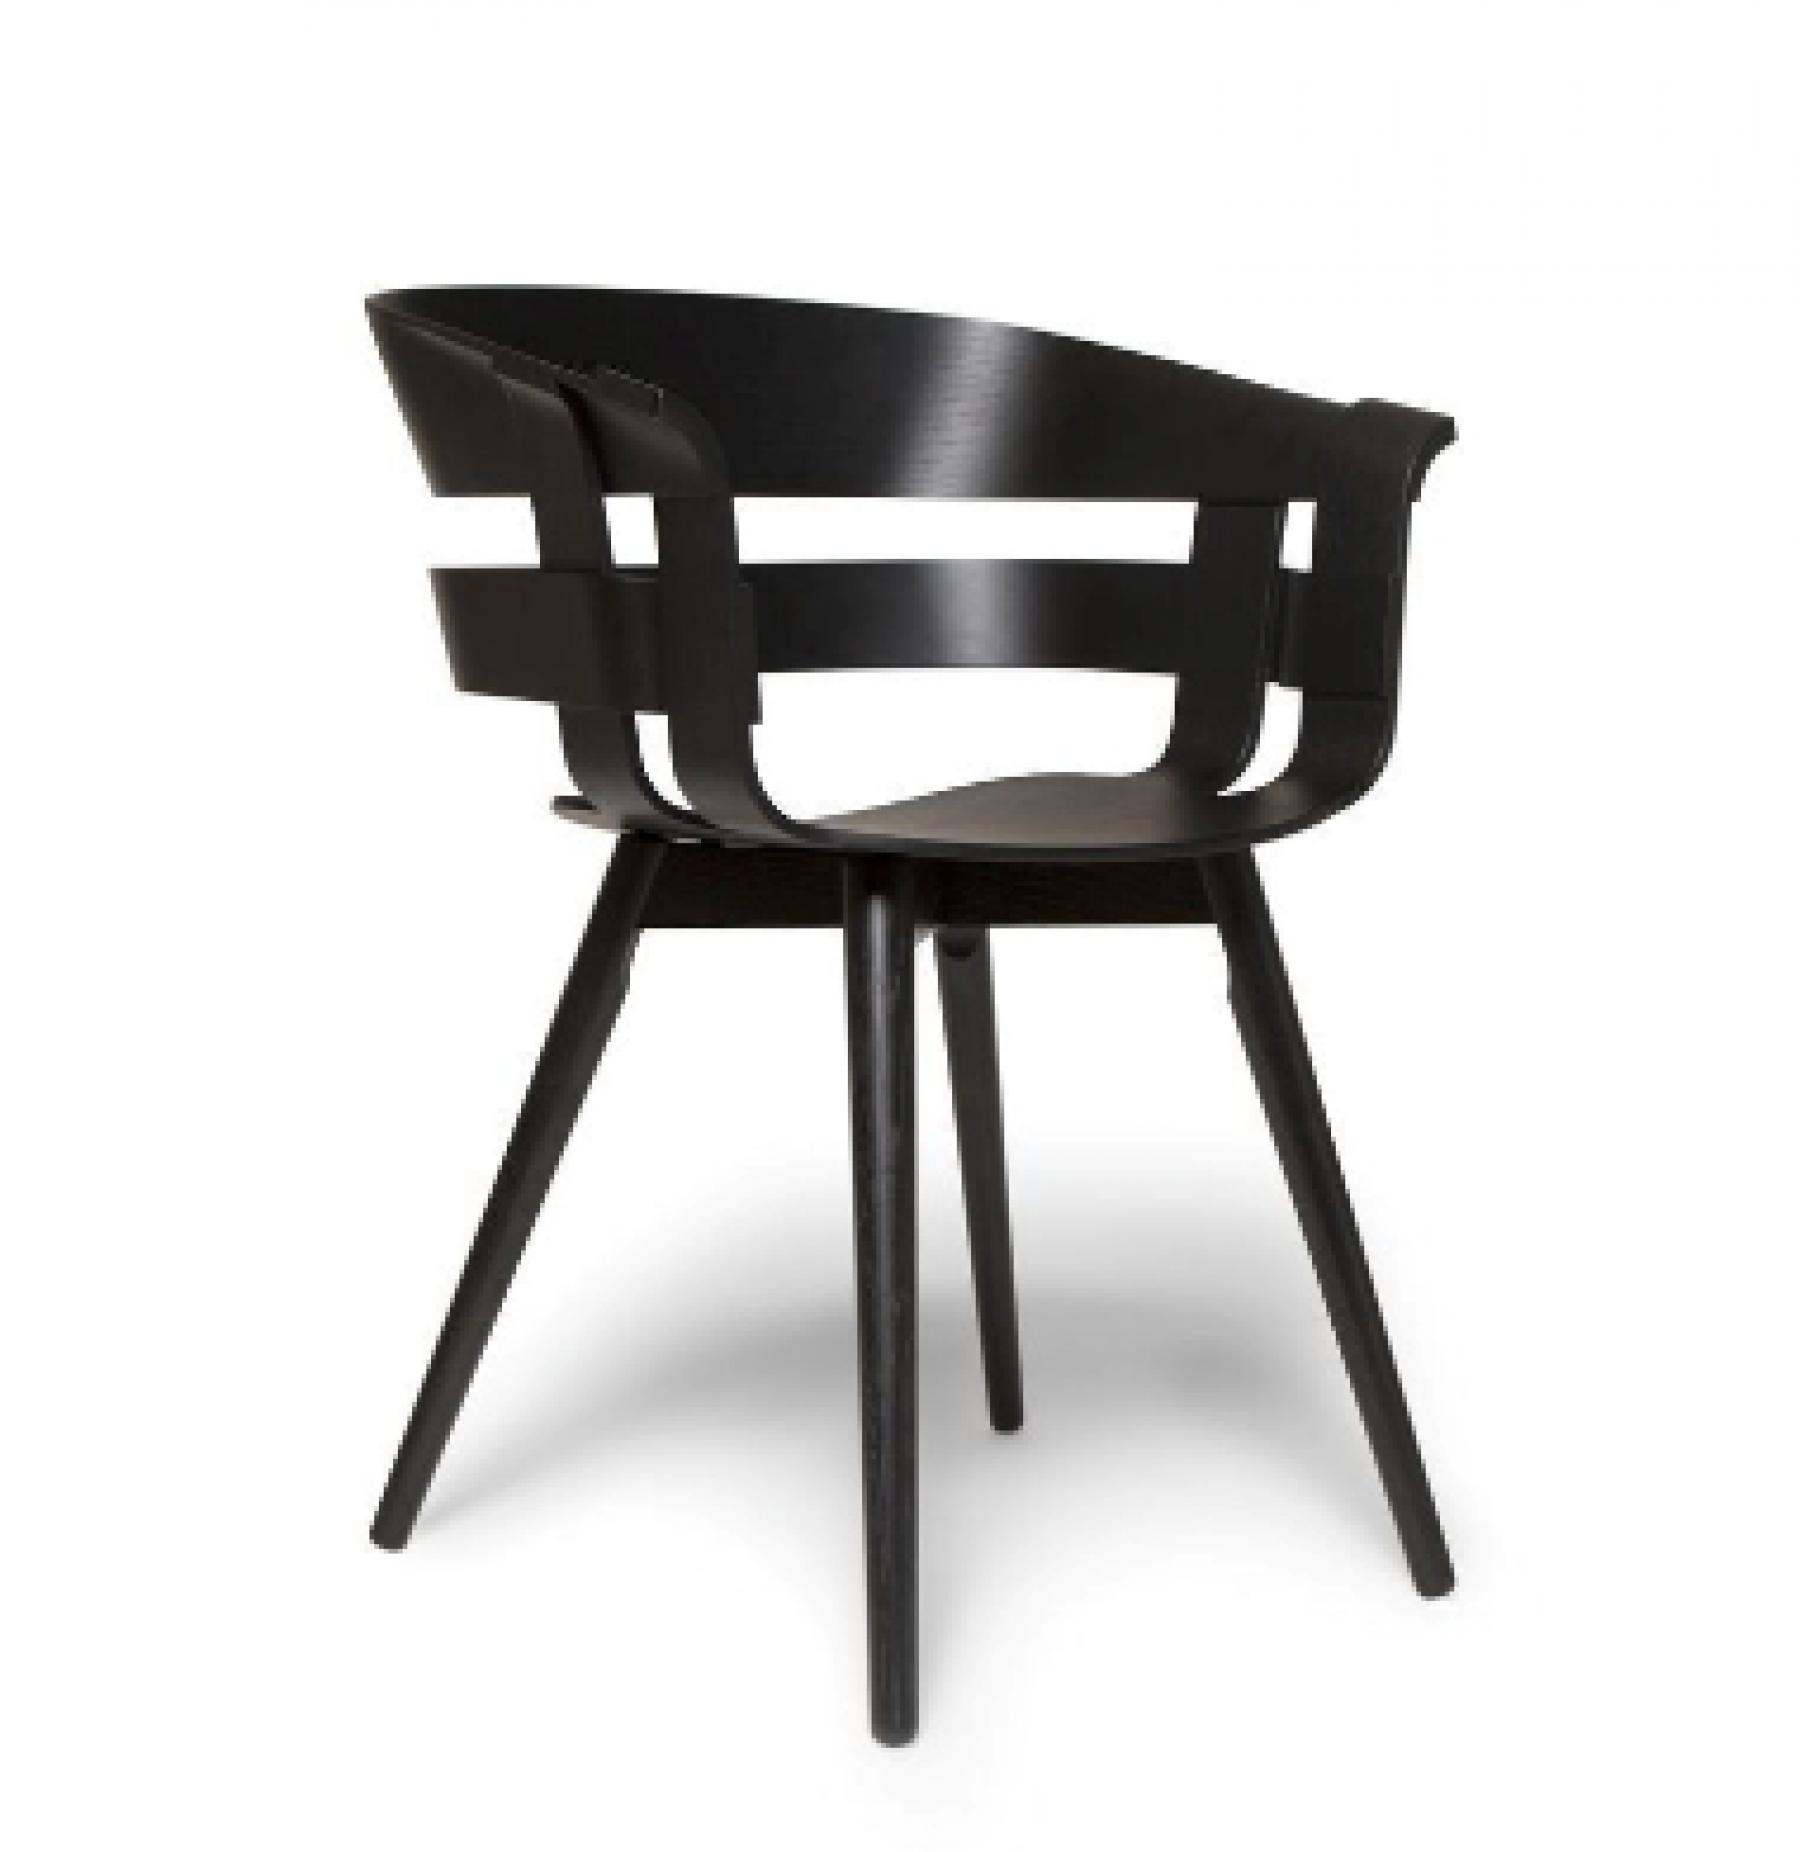 wick chair oktober design item skepp zweeds ontwerp